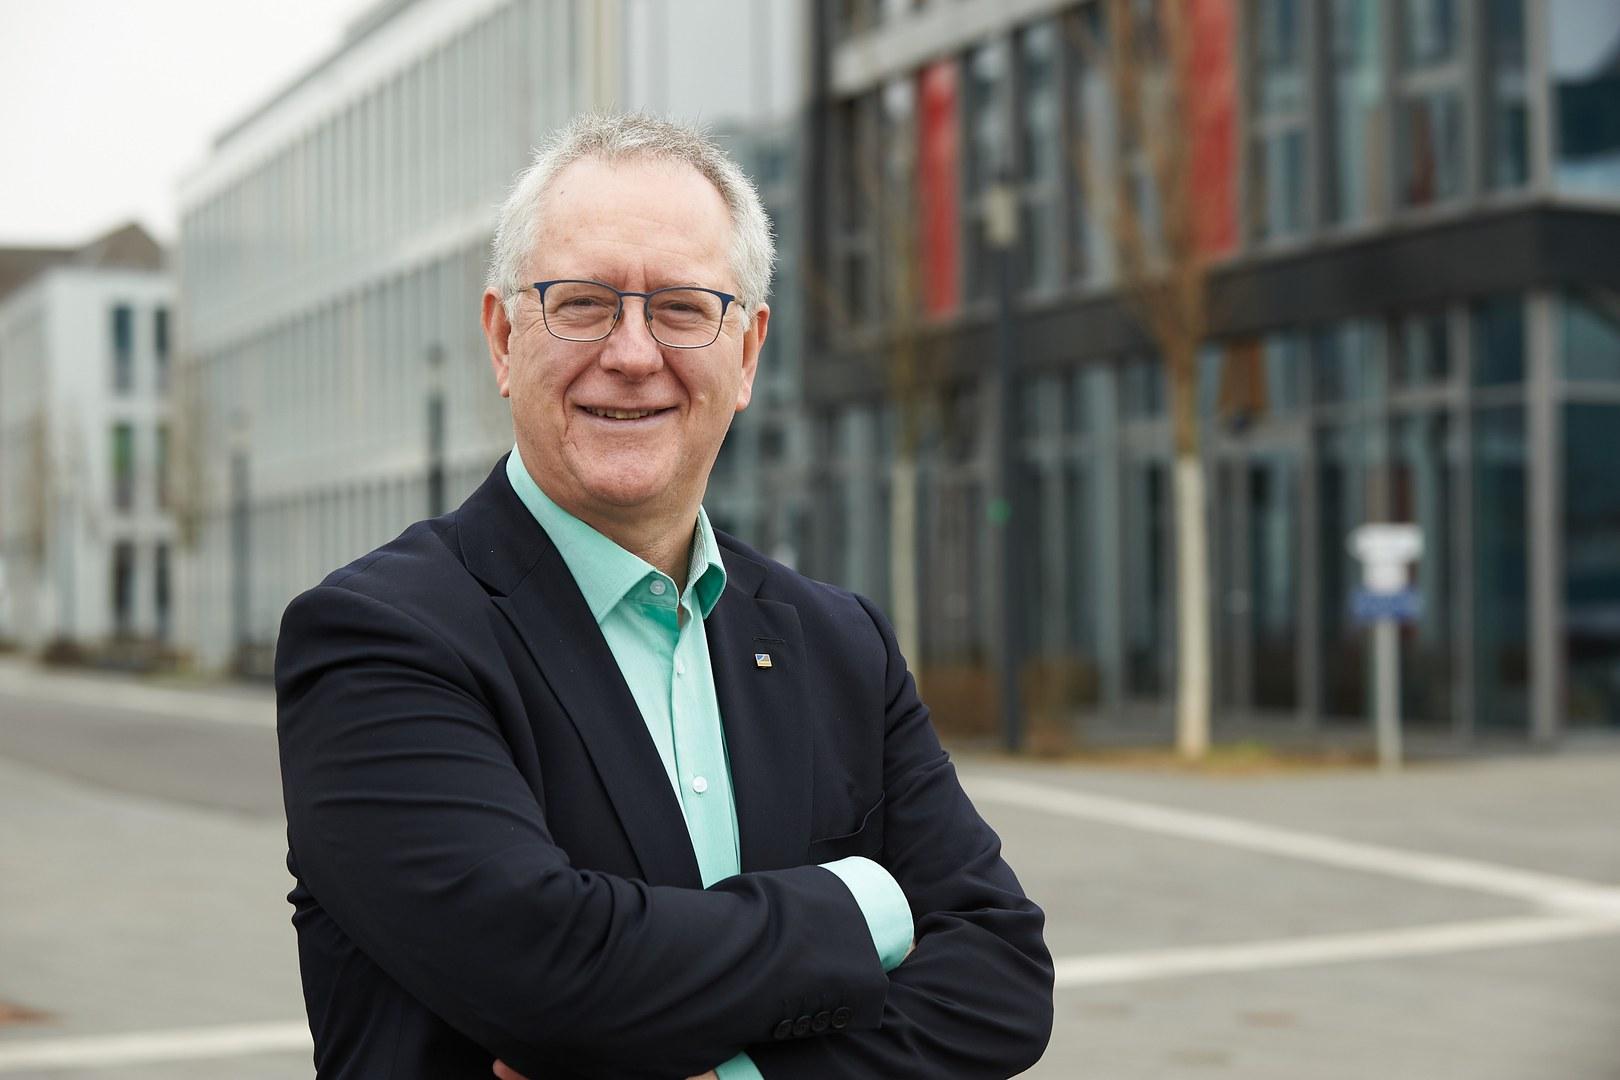 Rektor des Jahres - Prof. Dr. Dr. h.c. Michael Hoch